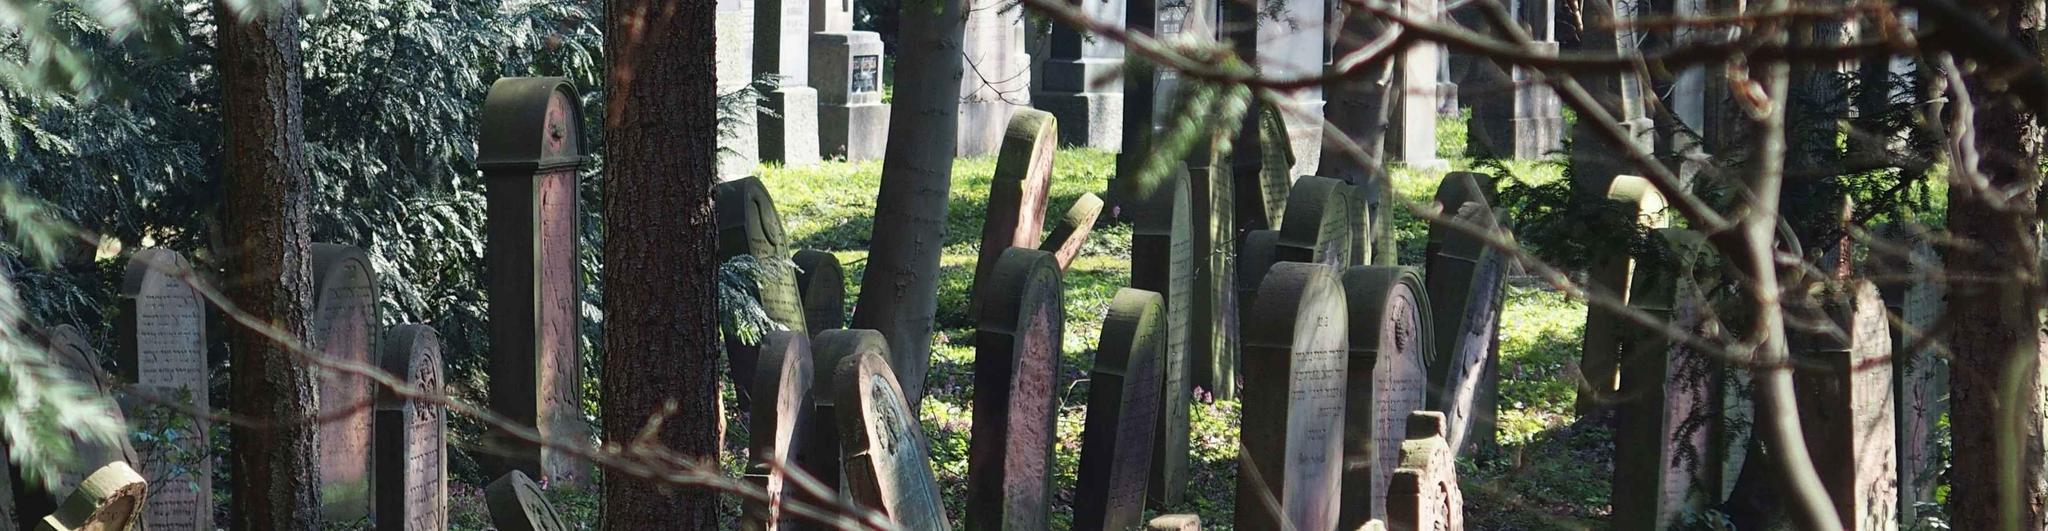 Friedhof Hanau